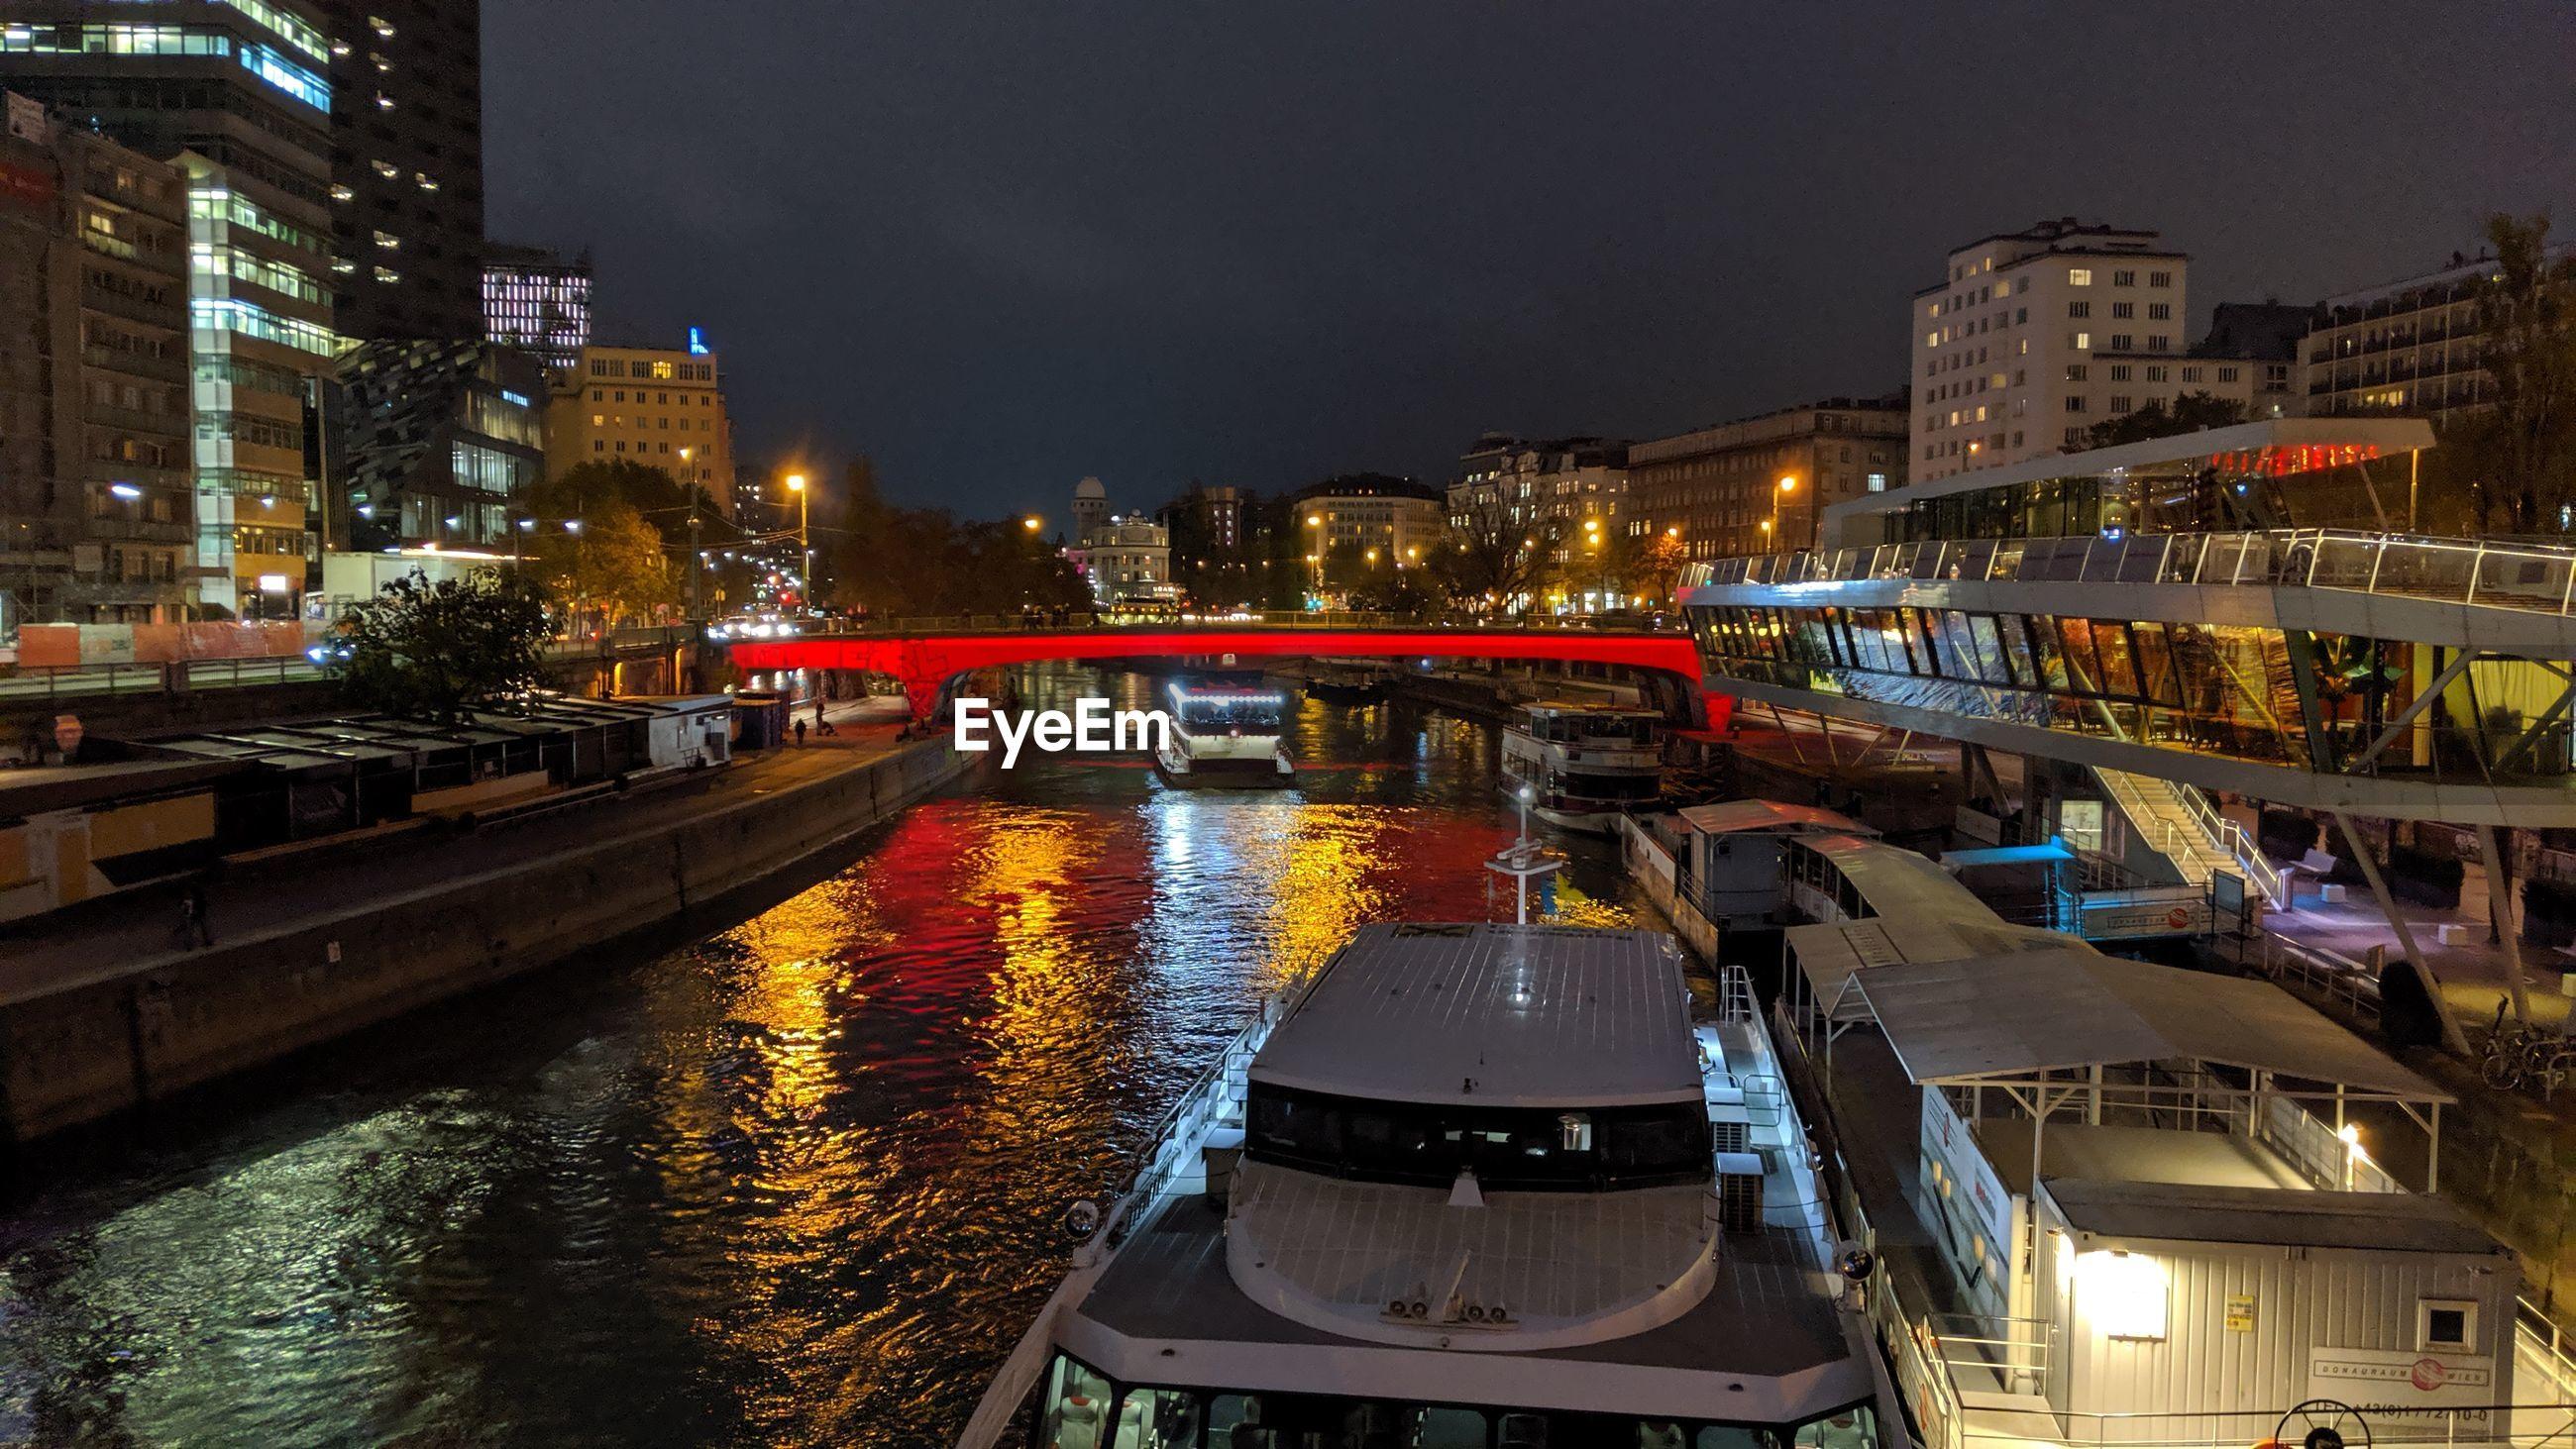 ILLUMINATED BRIDGE OVER RIVER AMIDST BUILDINGS AT NIGHT